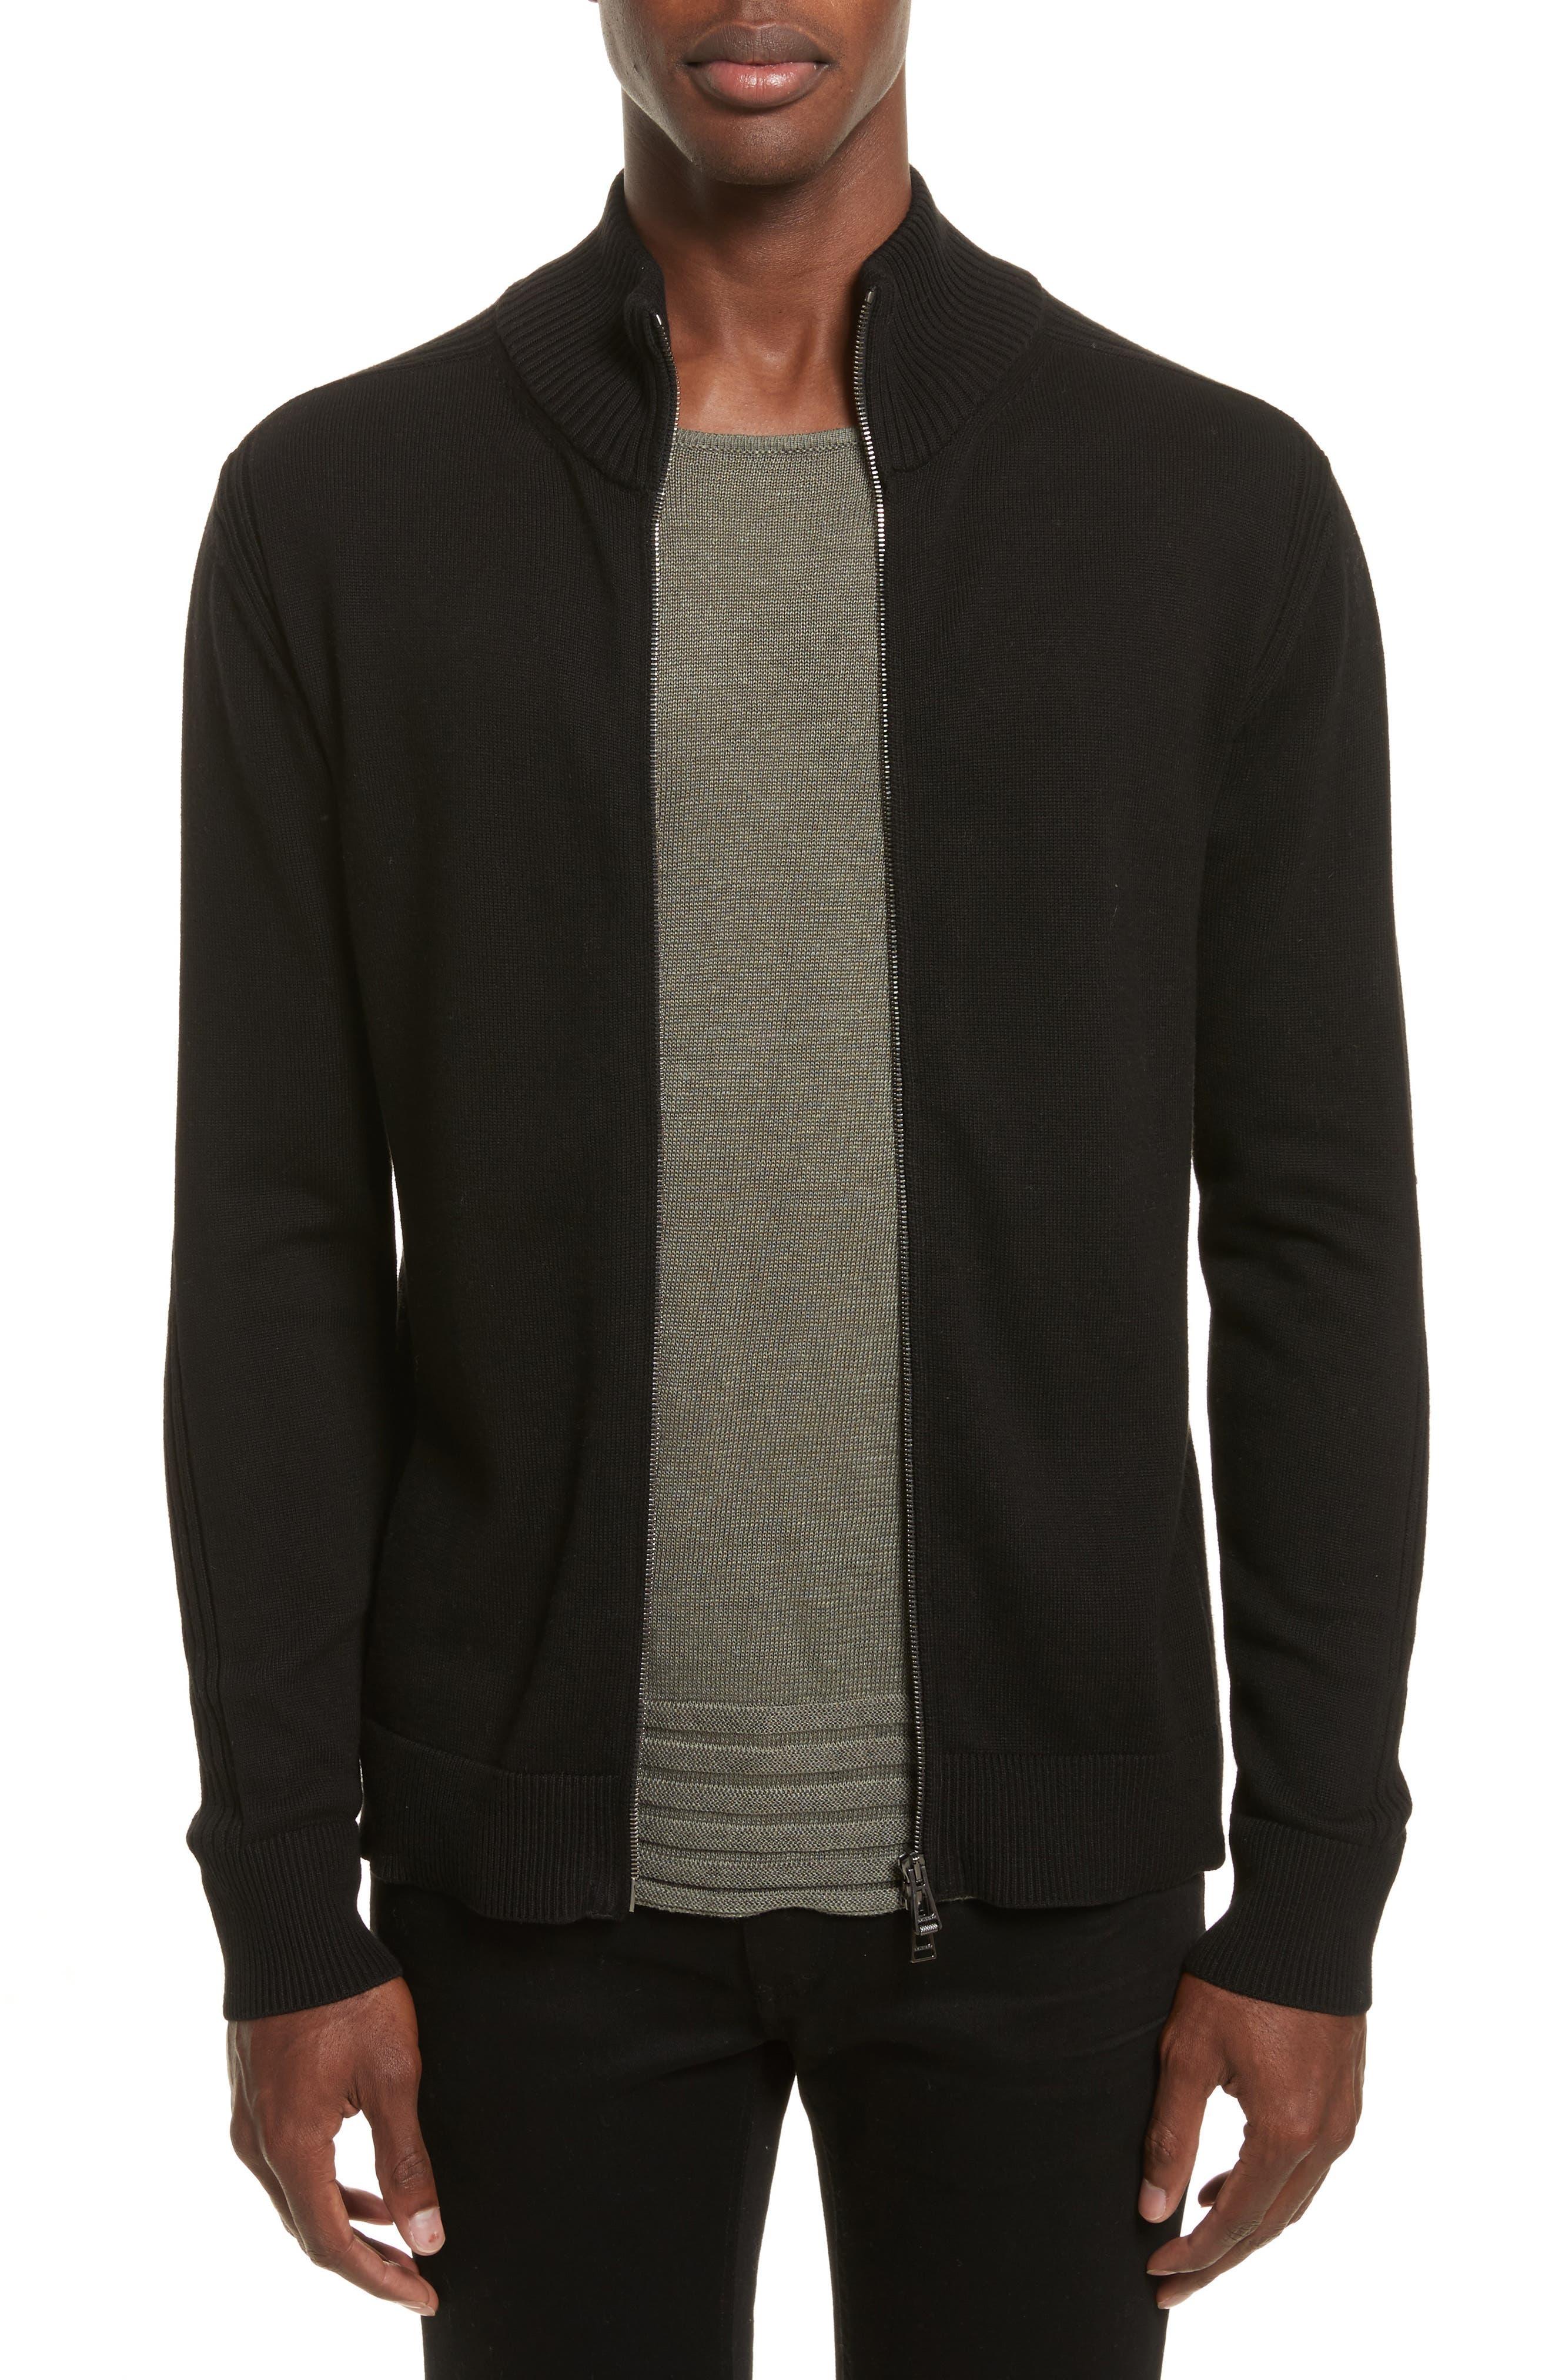 Main Image - Belstaff Allerford Knit Cotton Jacket